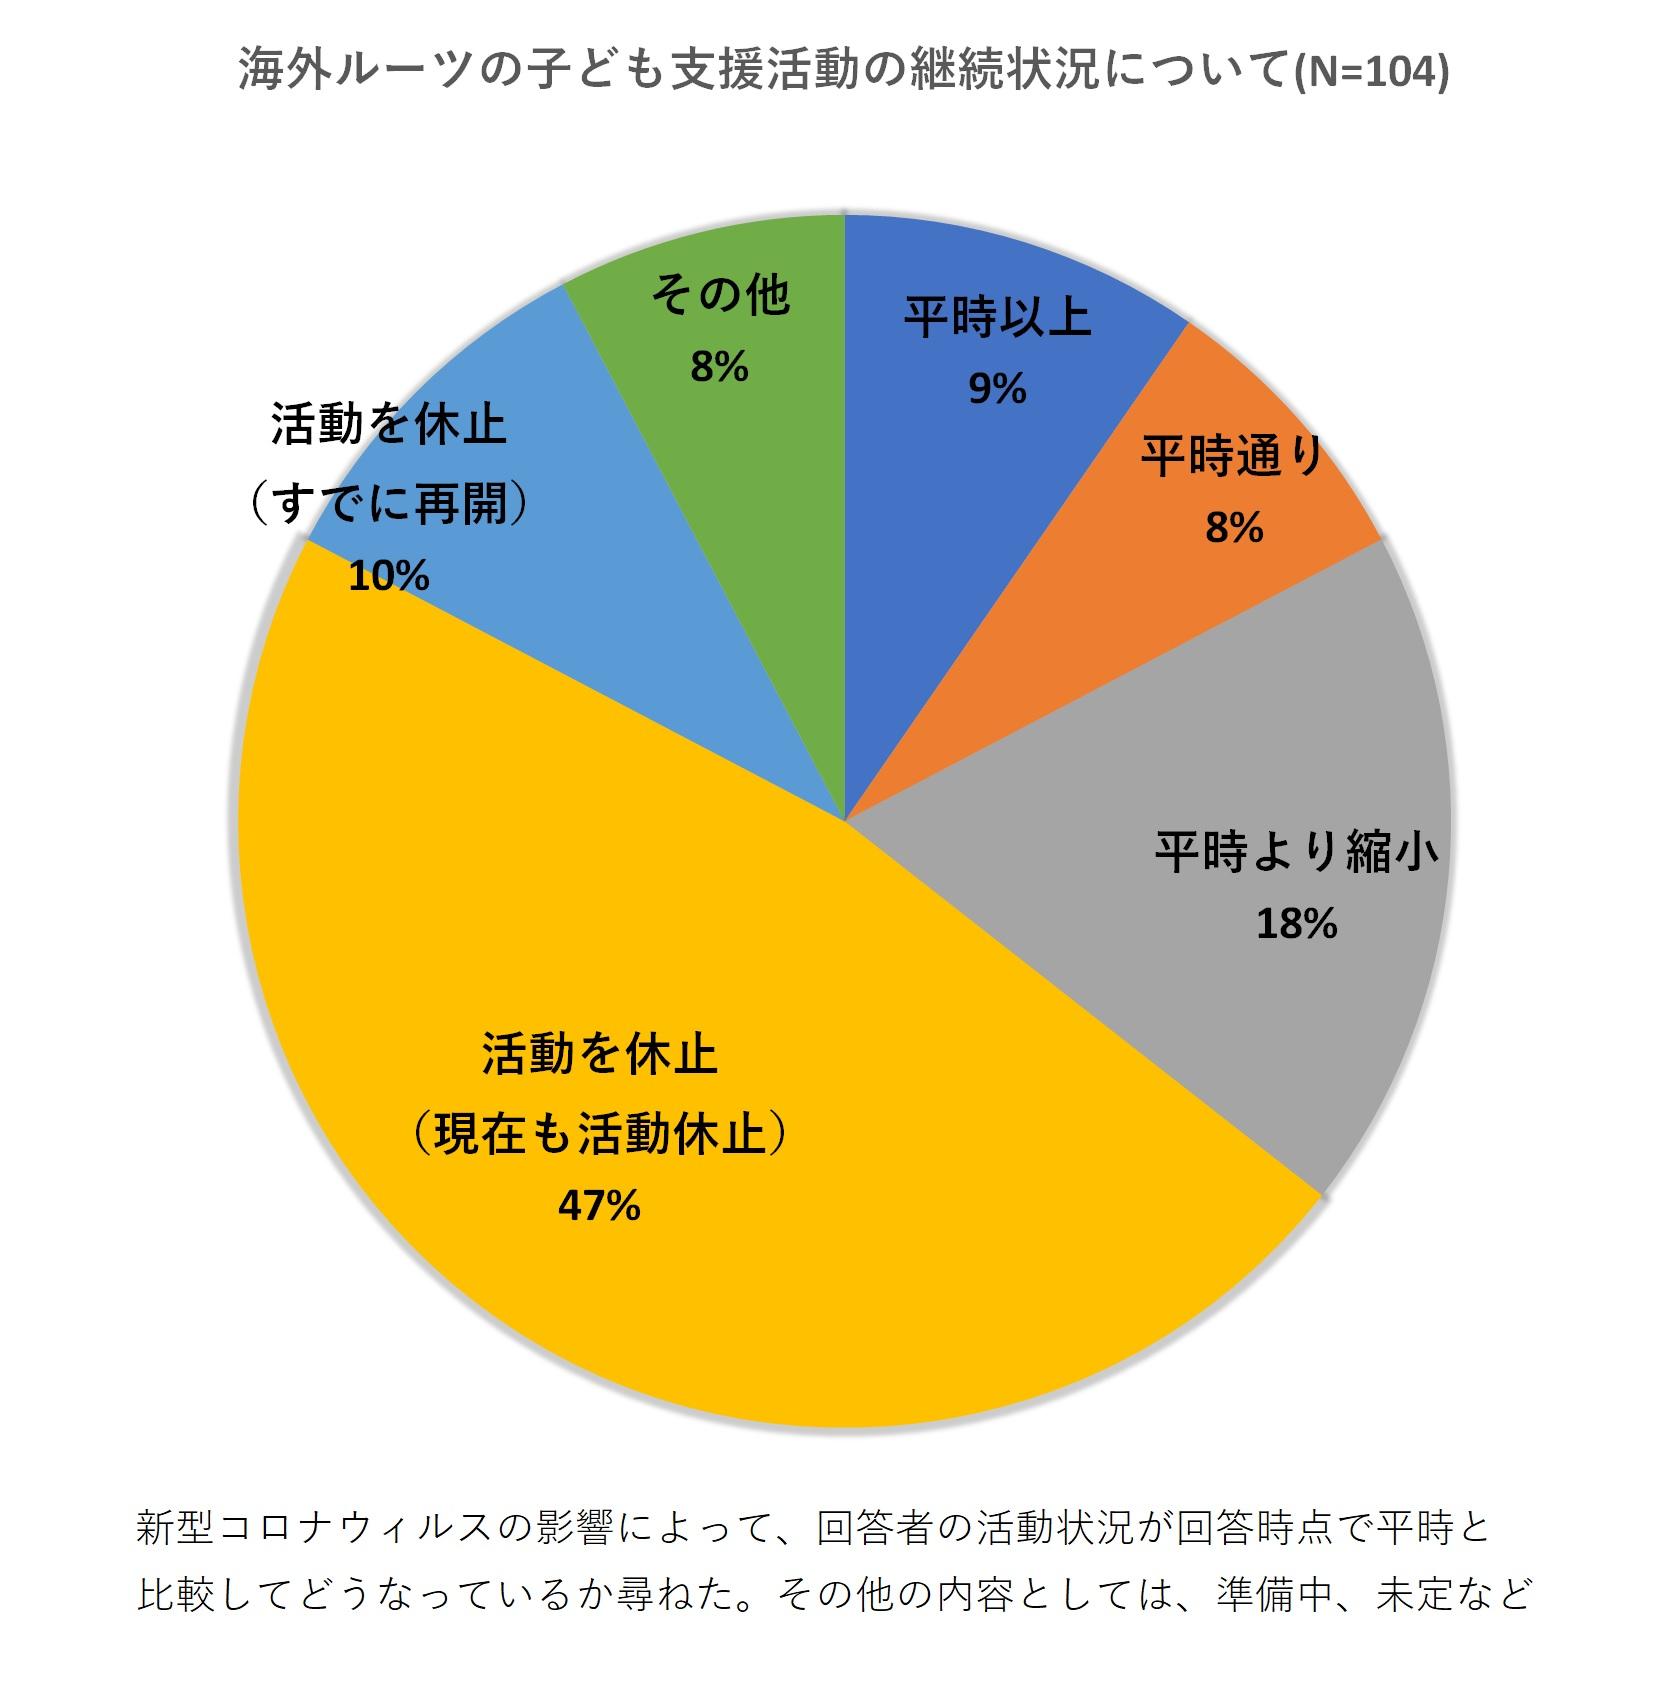 YSCグローバル・スクール:海外にルーツを持つ子どもの支援状況アンケート調査結果